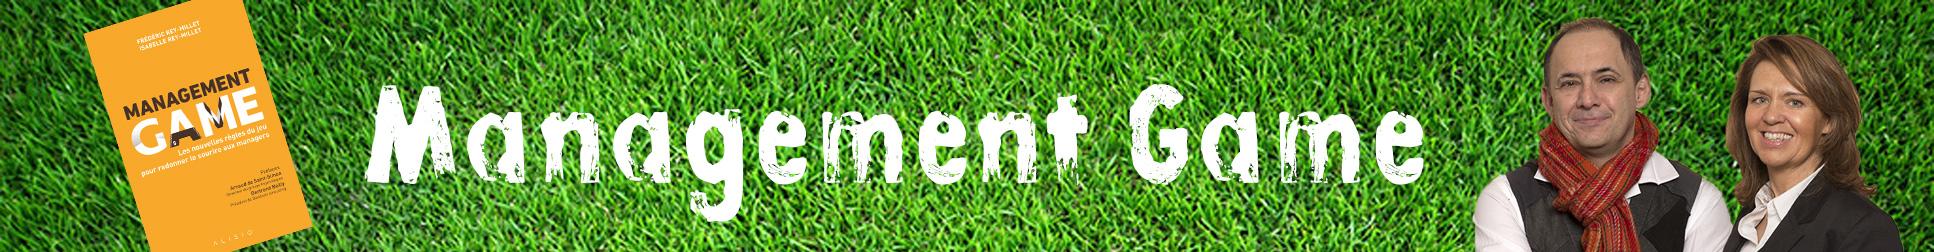 management game banner